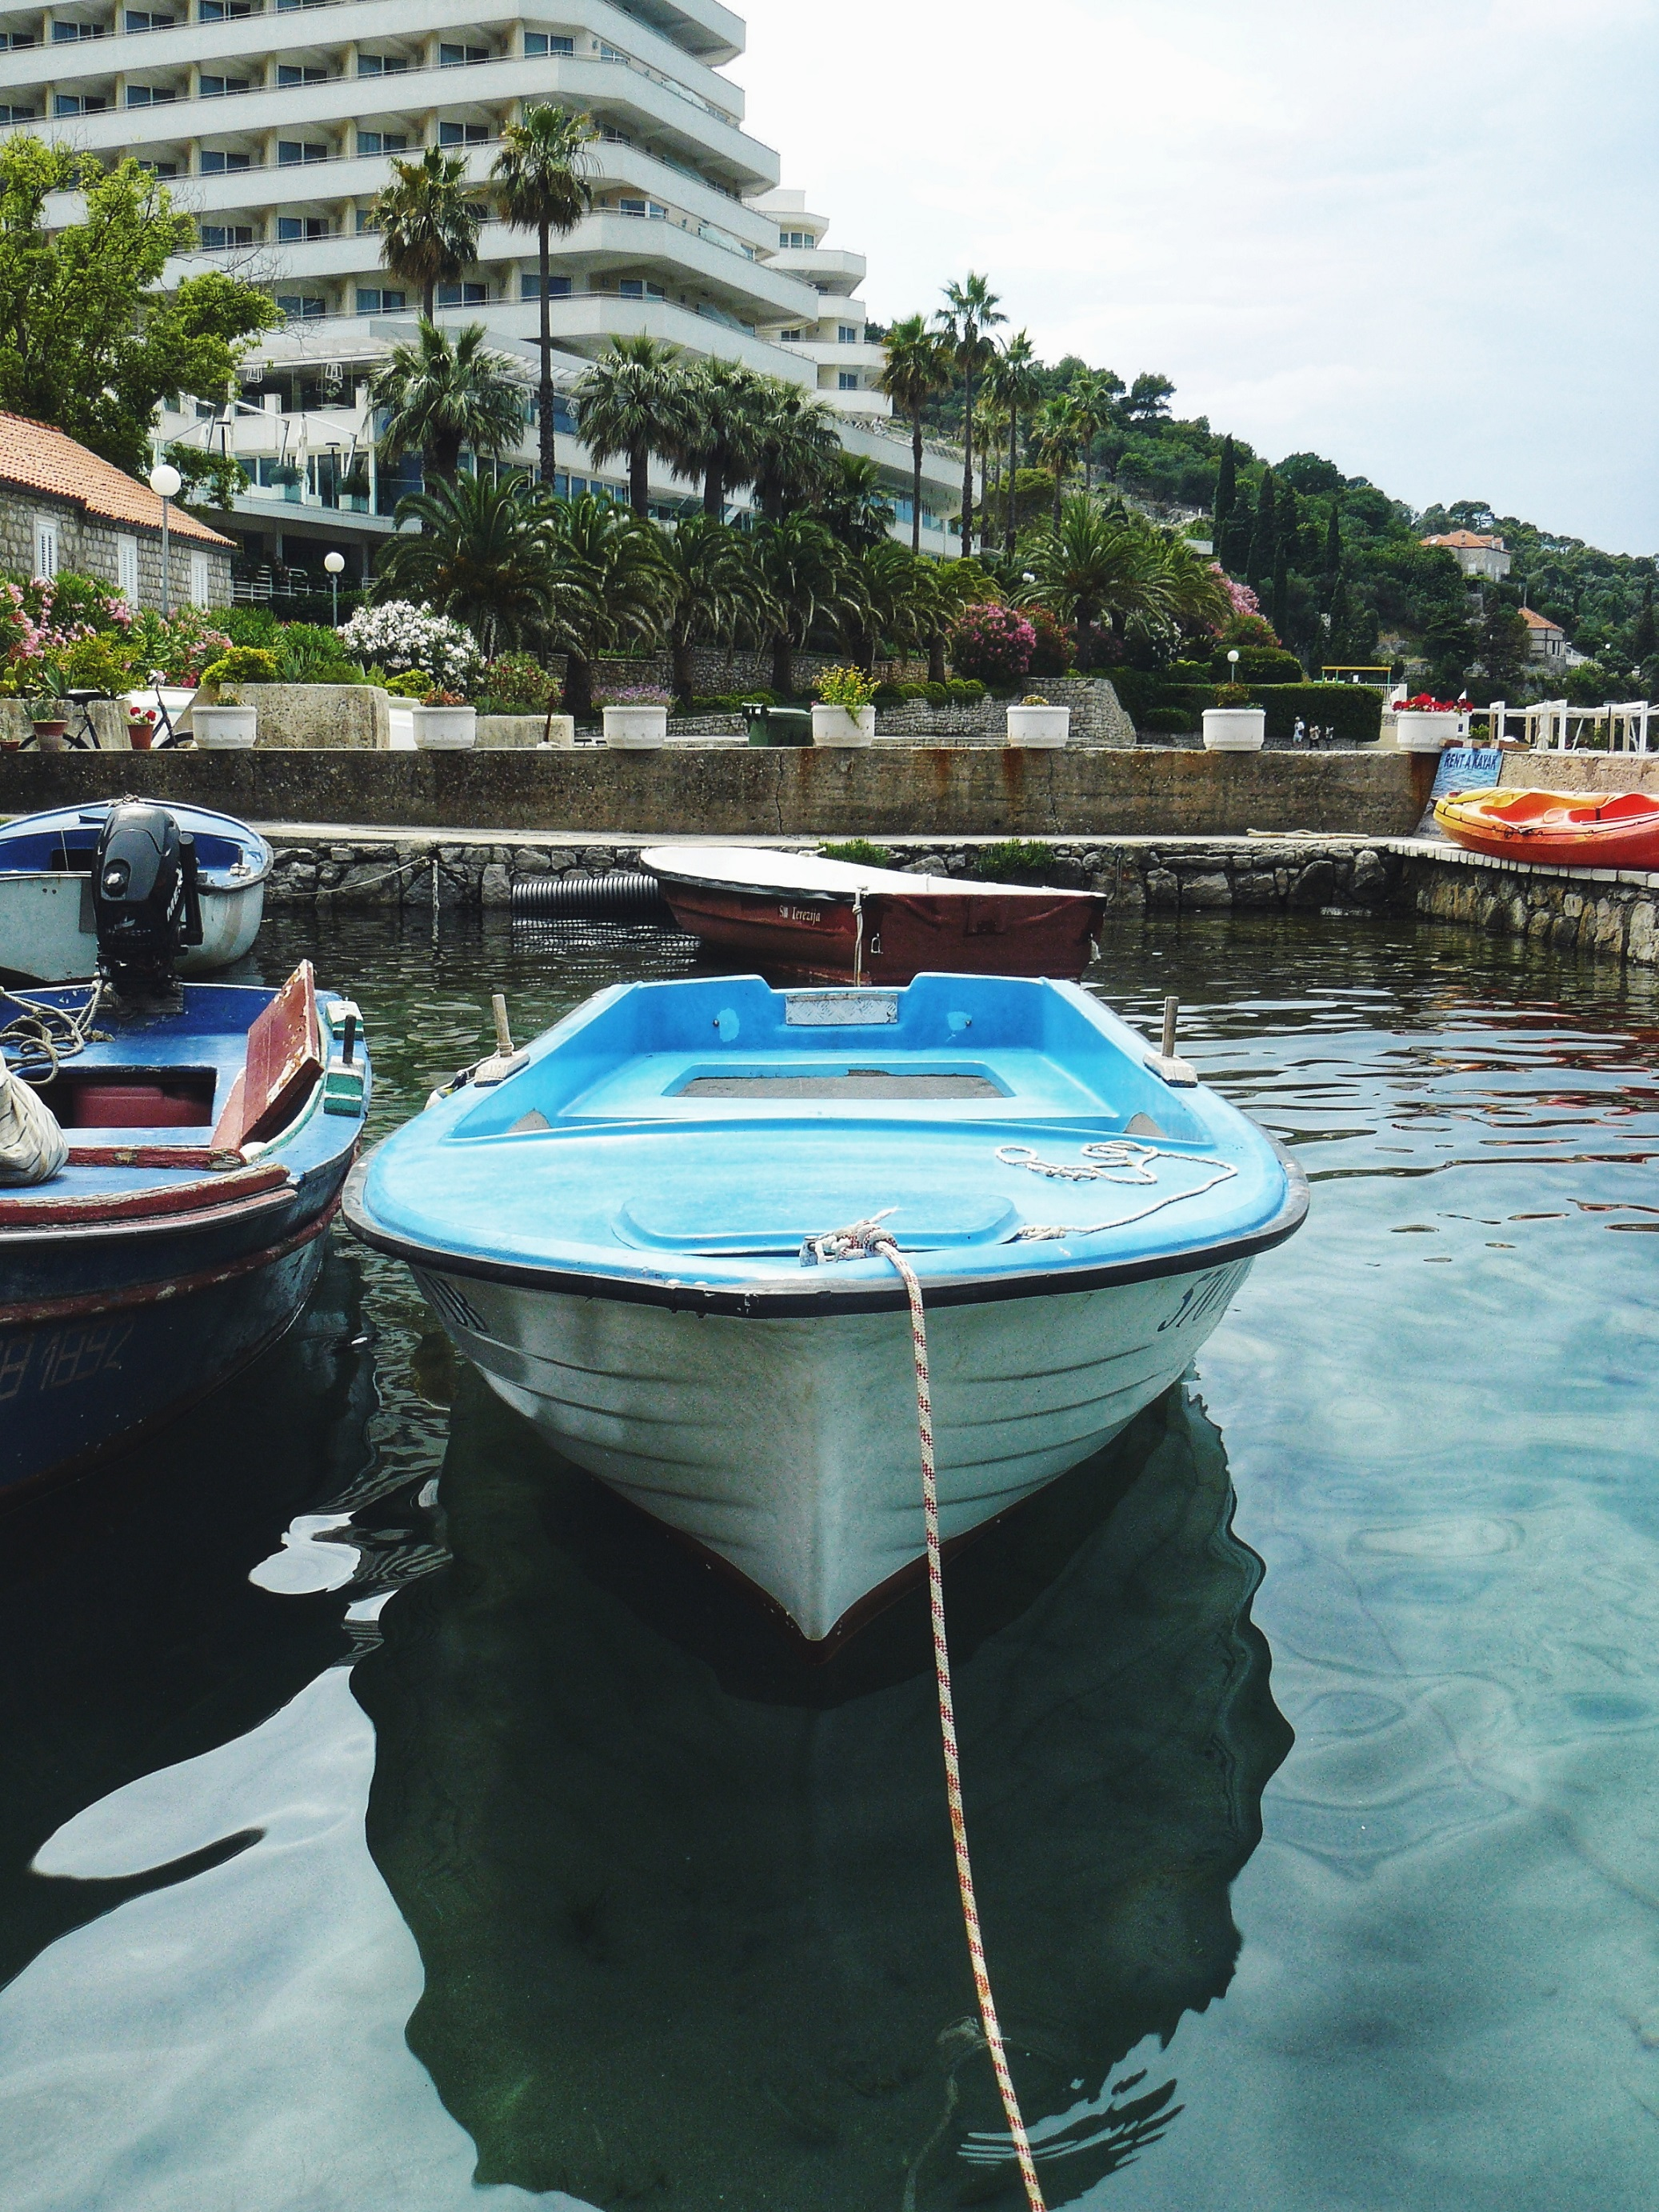 Outlandish blog travel Croatia Elafiti Islands cruise adventure